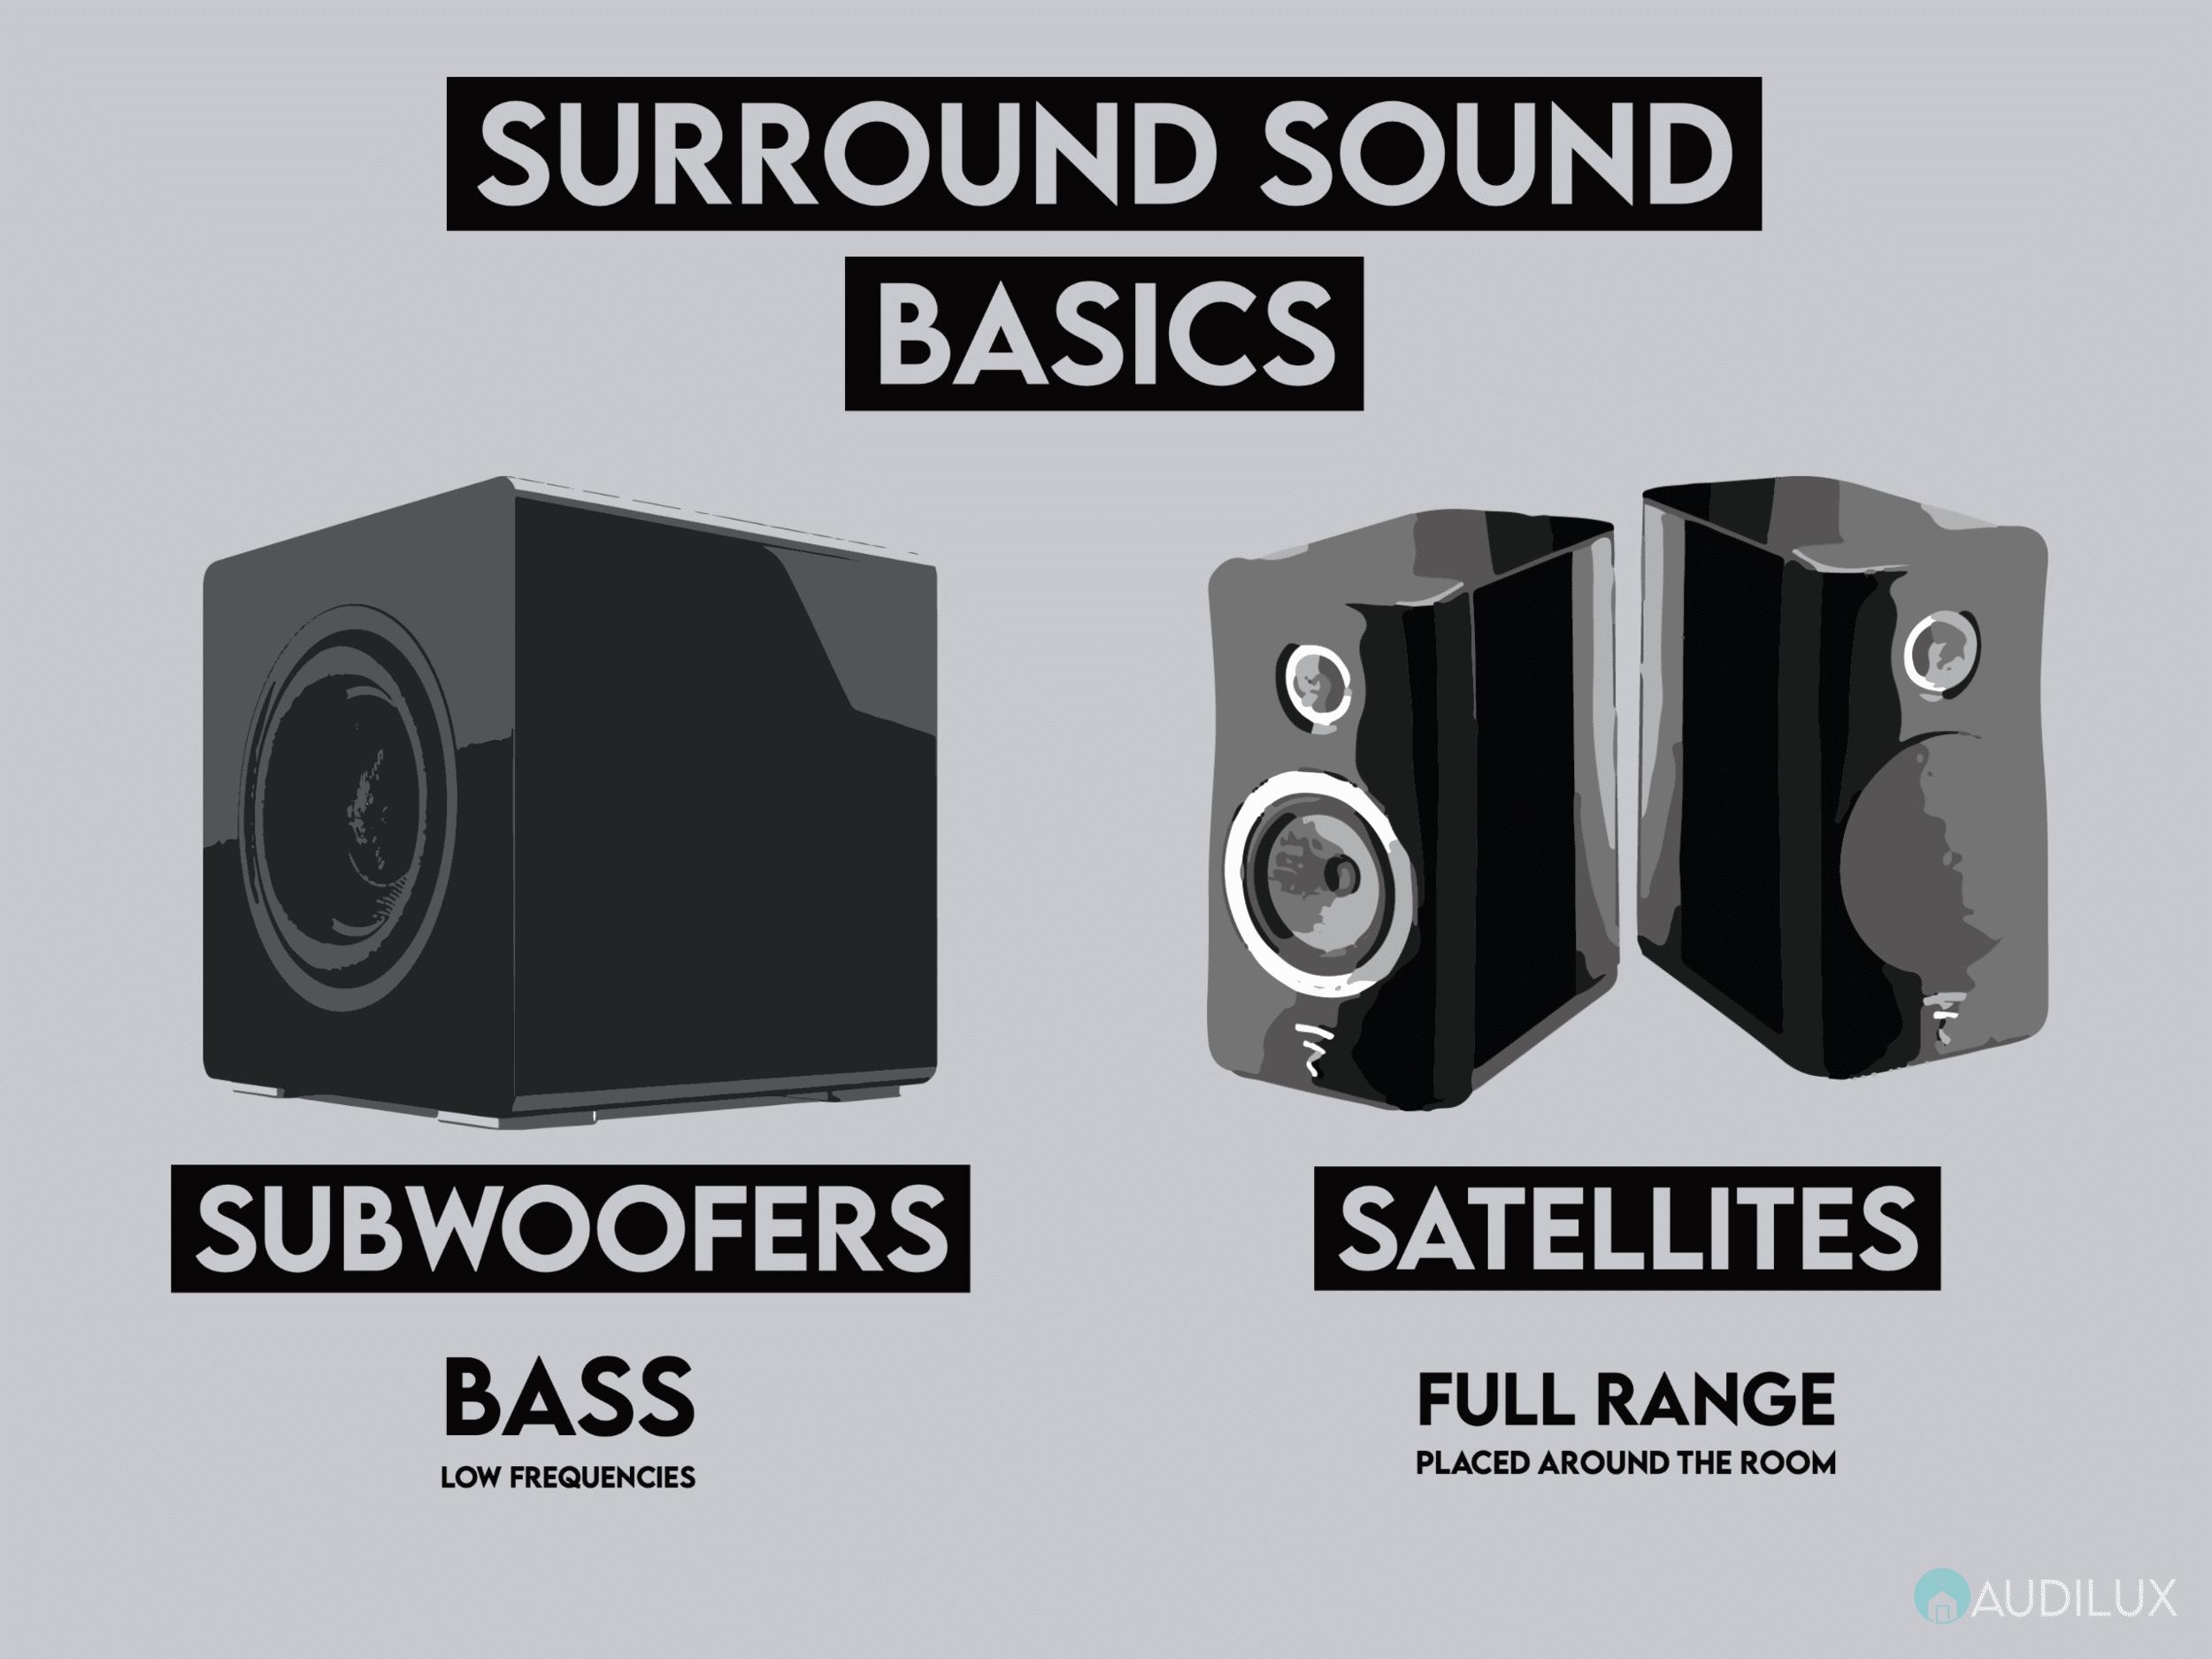 Best Guide to Surround Sound Basics